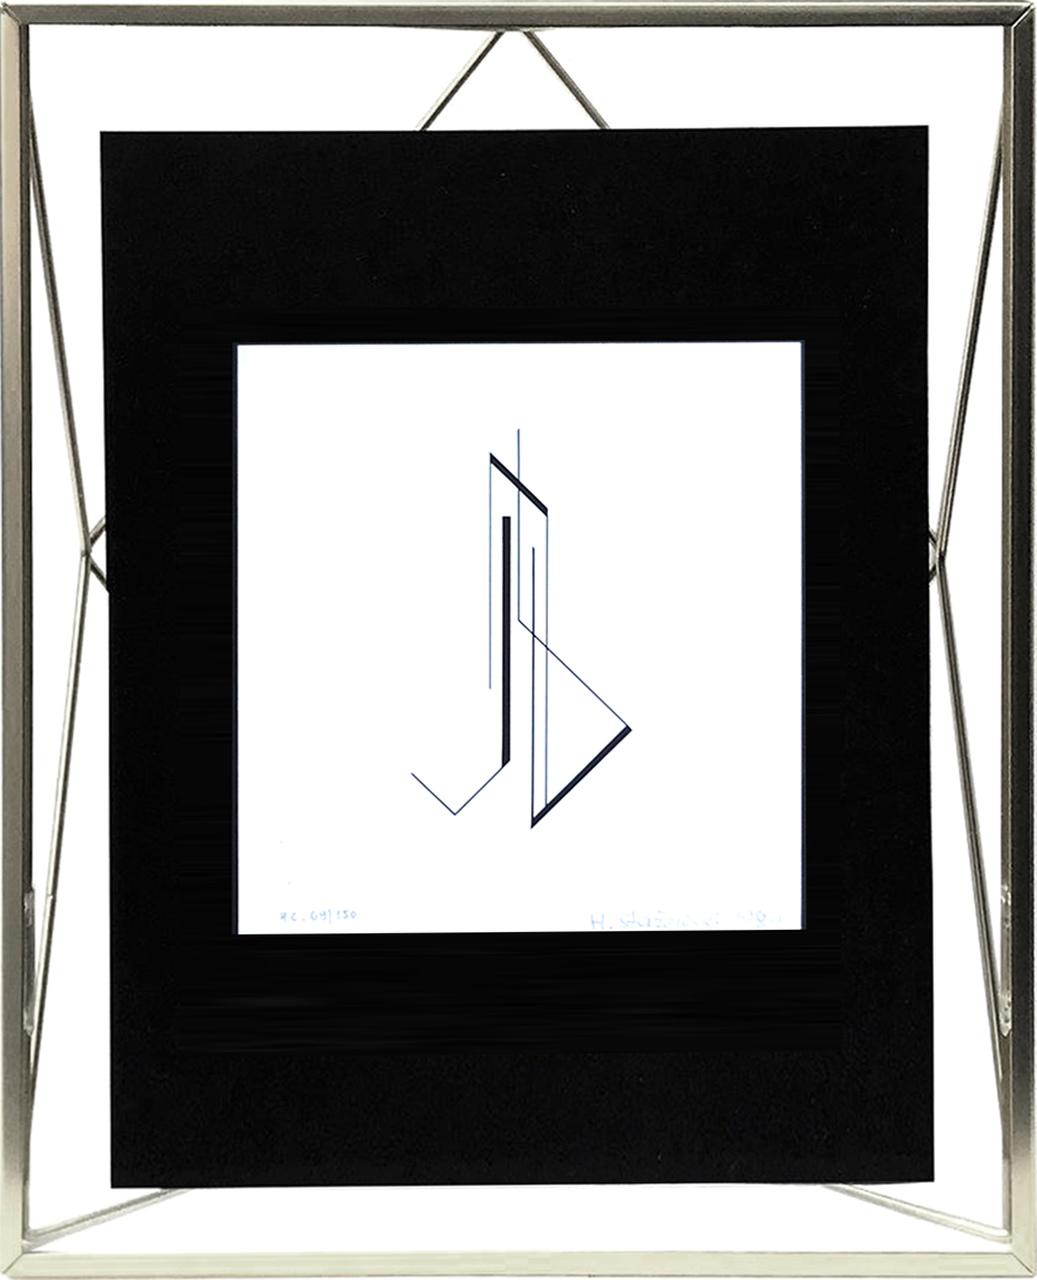 Geometria (69/150), 1984